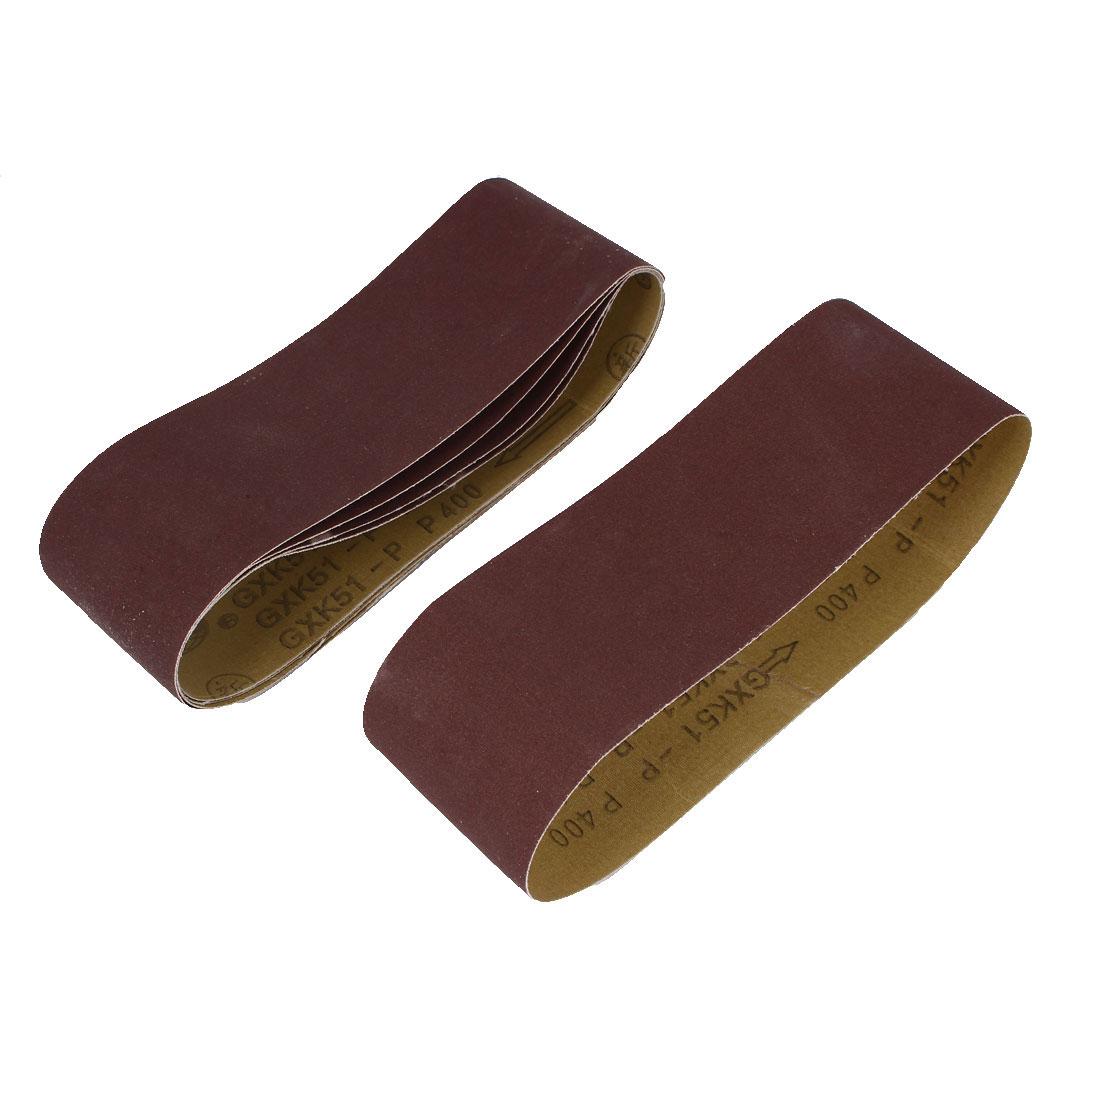 Woodworking 533mmx75mm 400 Grit Abrasive Sanding Belt Sandpaper 5pcs